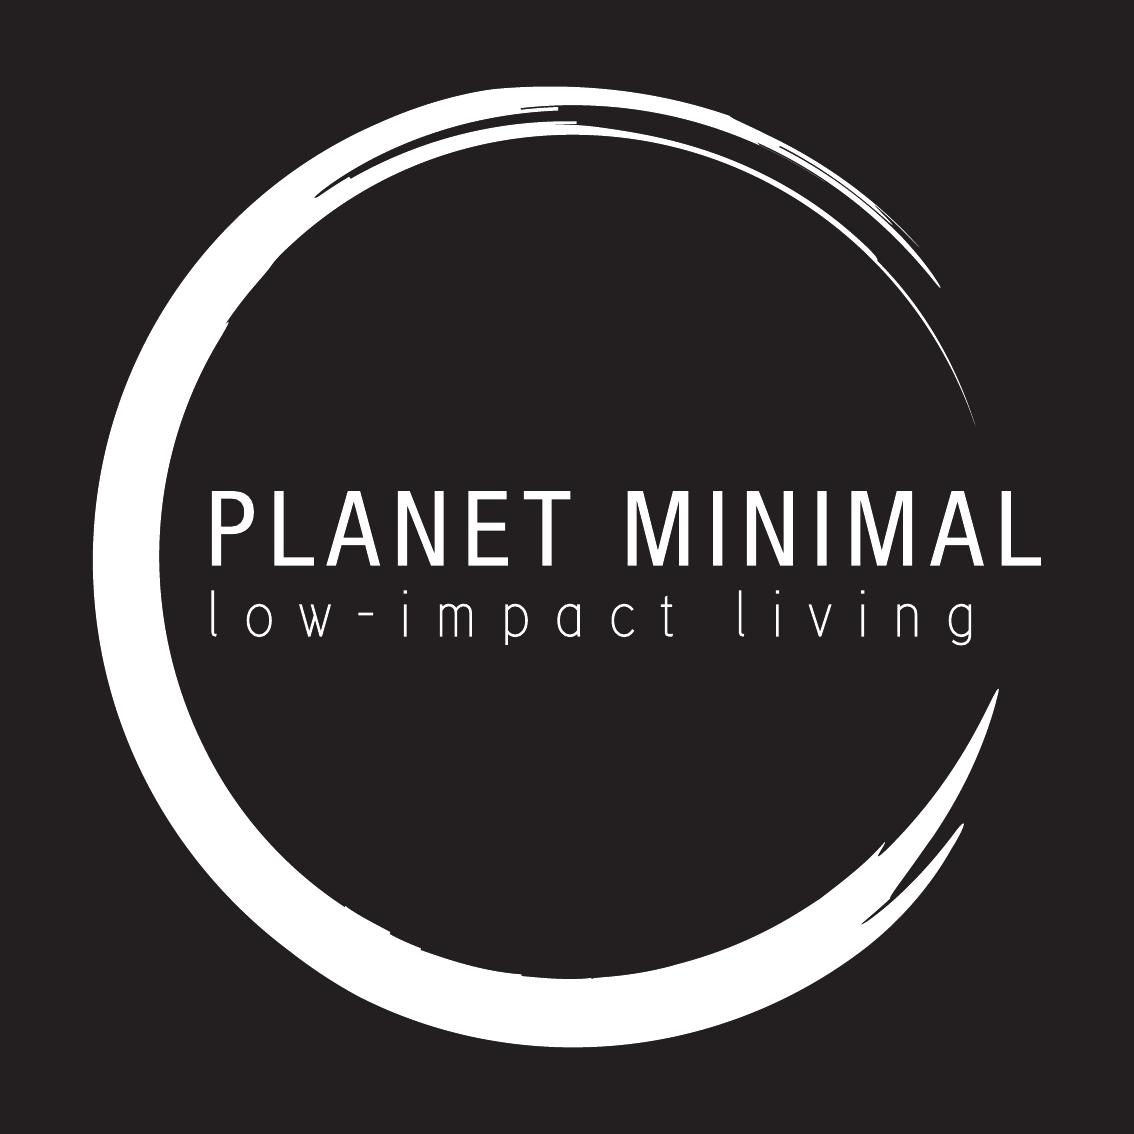 Planet Minimal